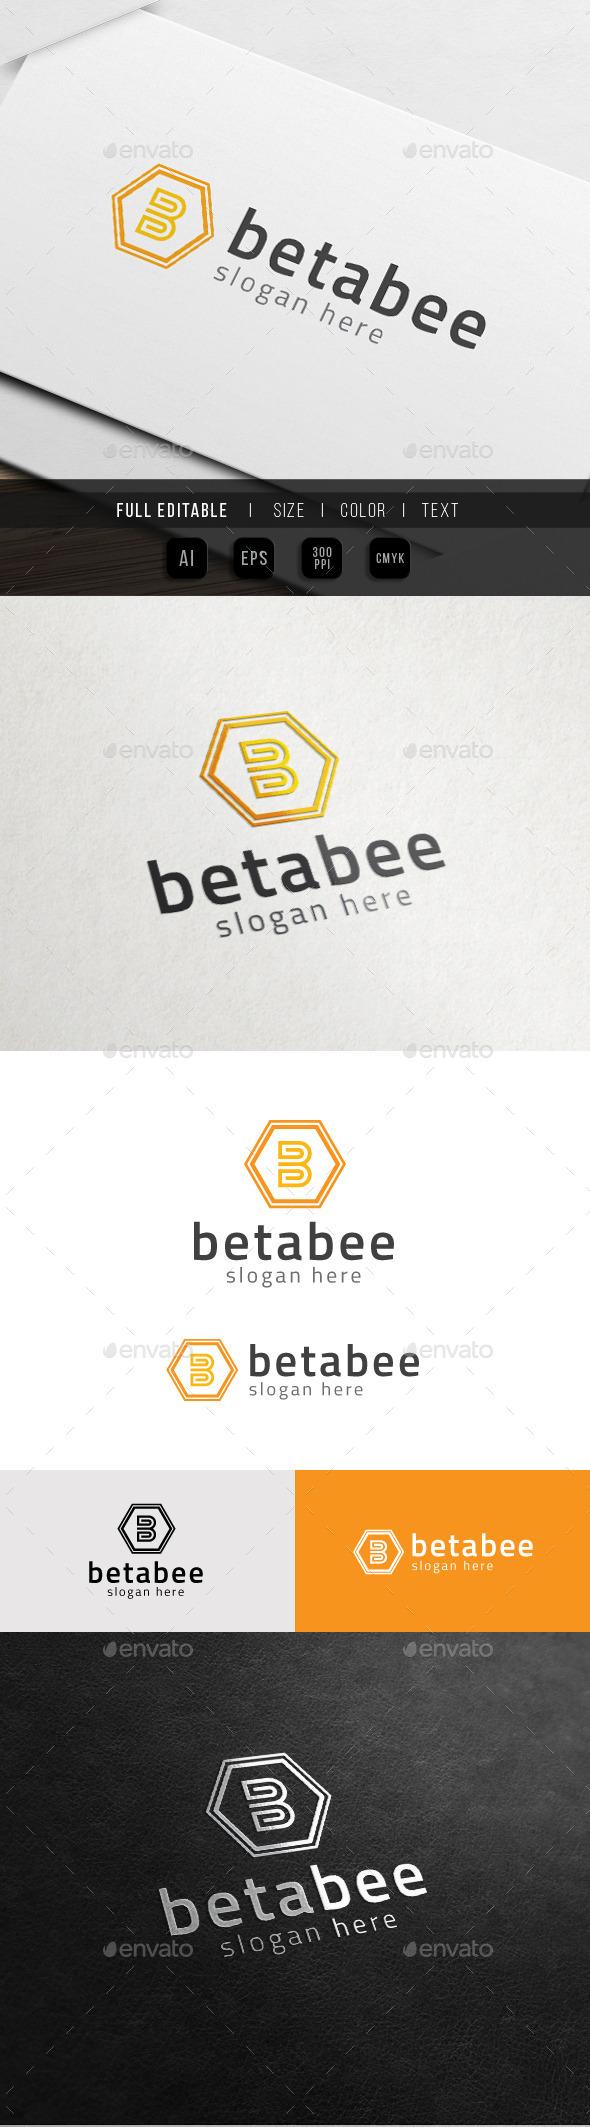 GraphicRiver Bee Business Hexa Brand B 10817073